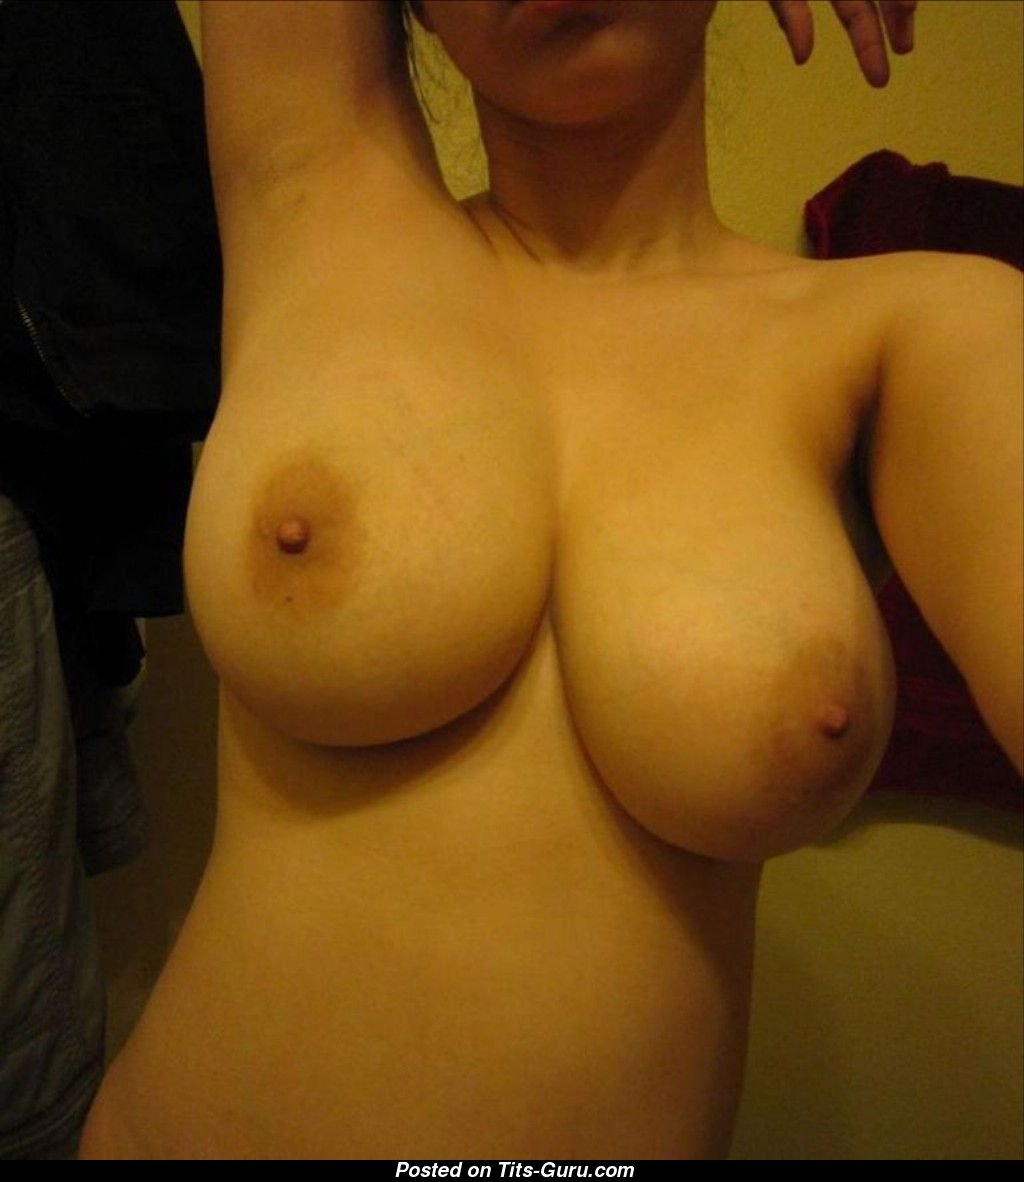 Tits selfie up close